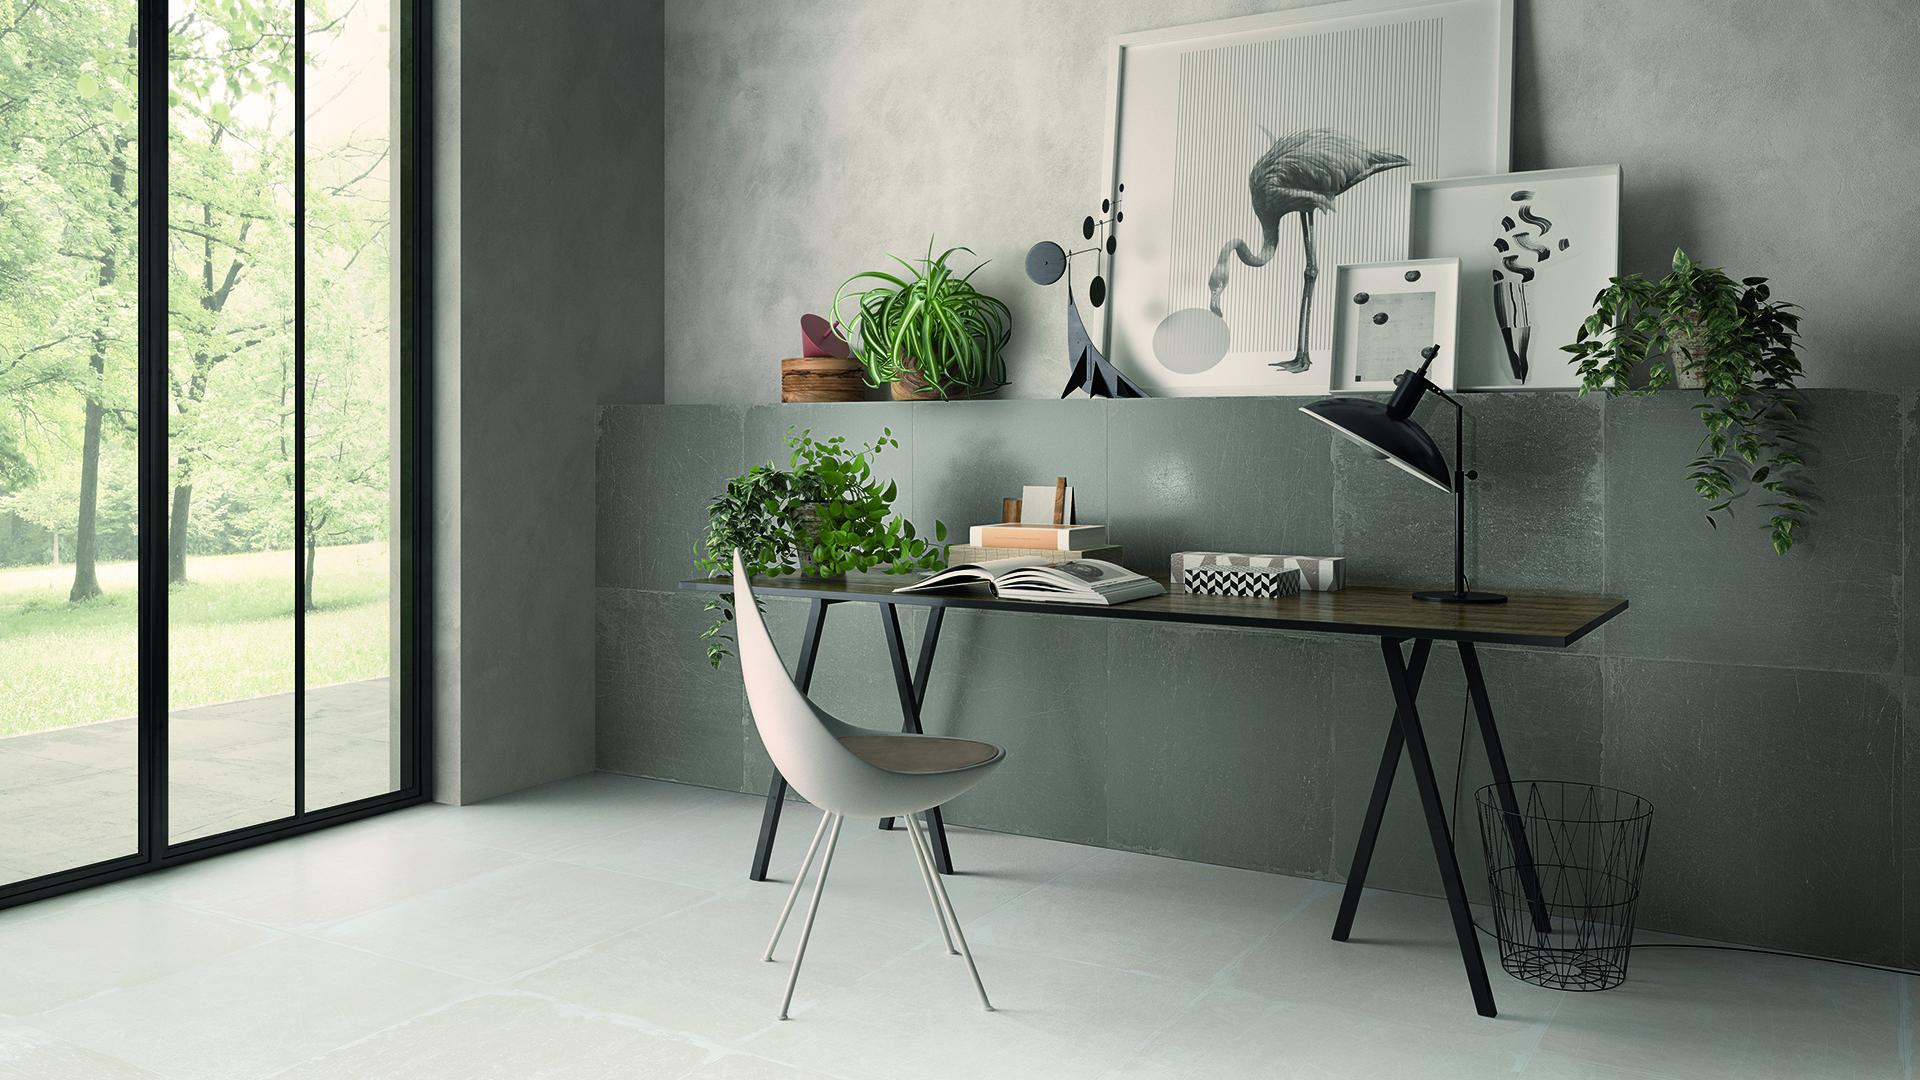 LH Bianco-Cenere Studio 60x60 Amb. Studio Orizz